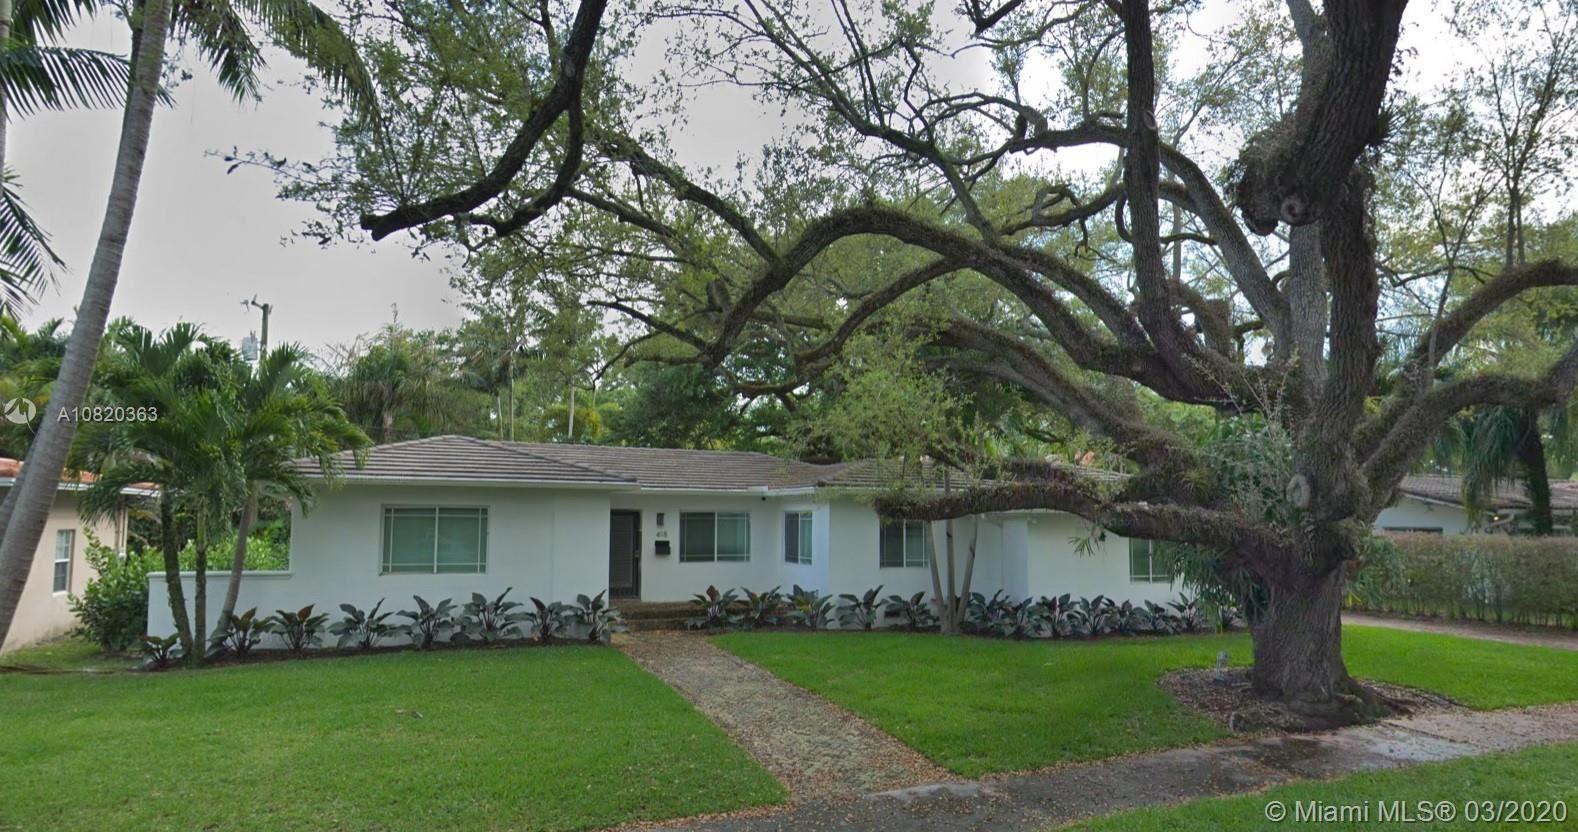 418 Castania Ave, Coral Gables, FL 33146 - #: A10820363